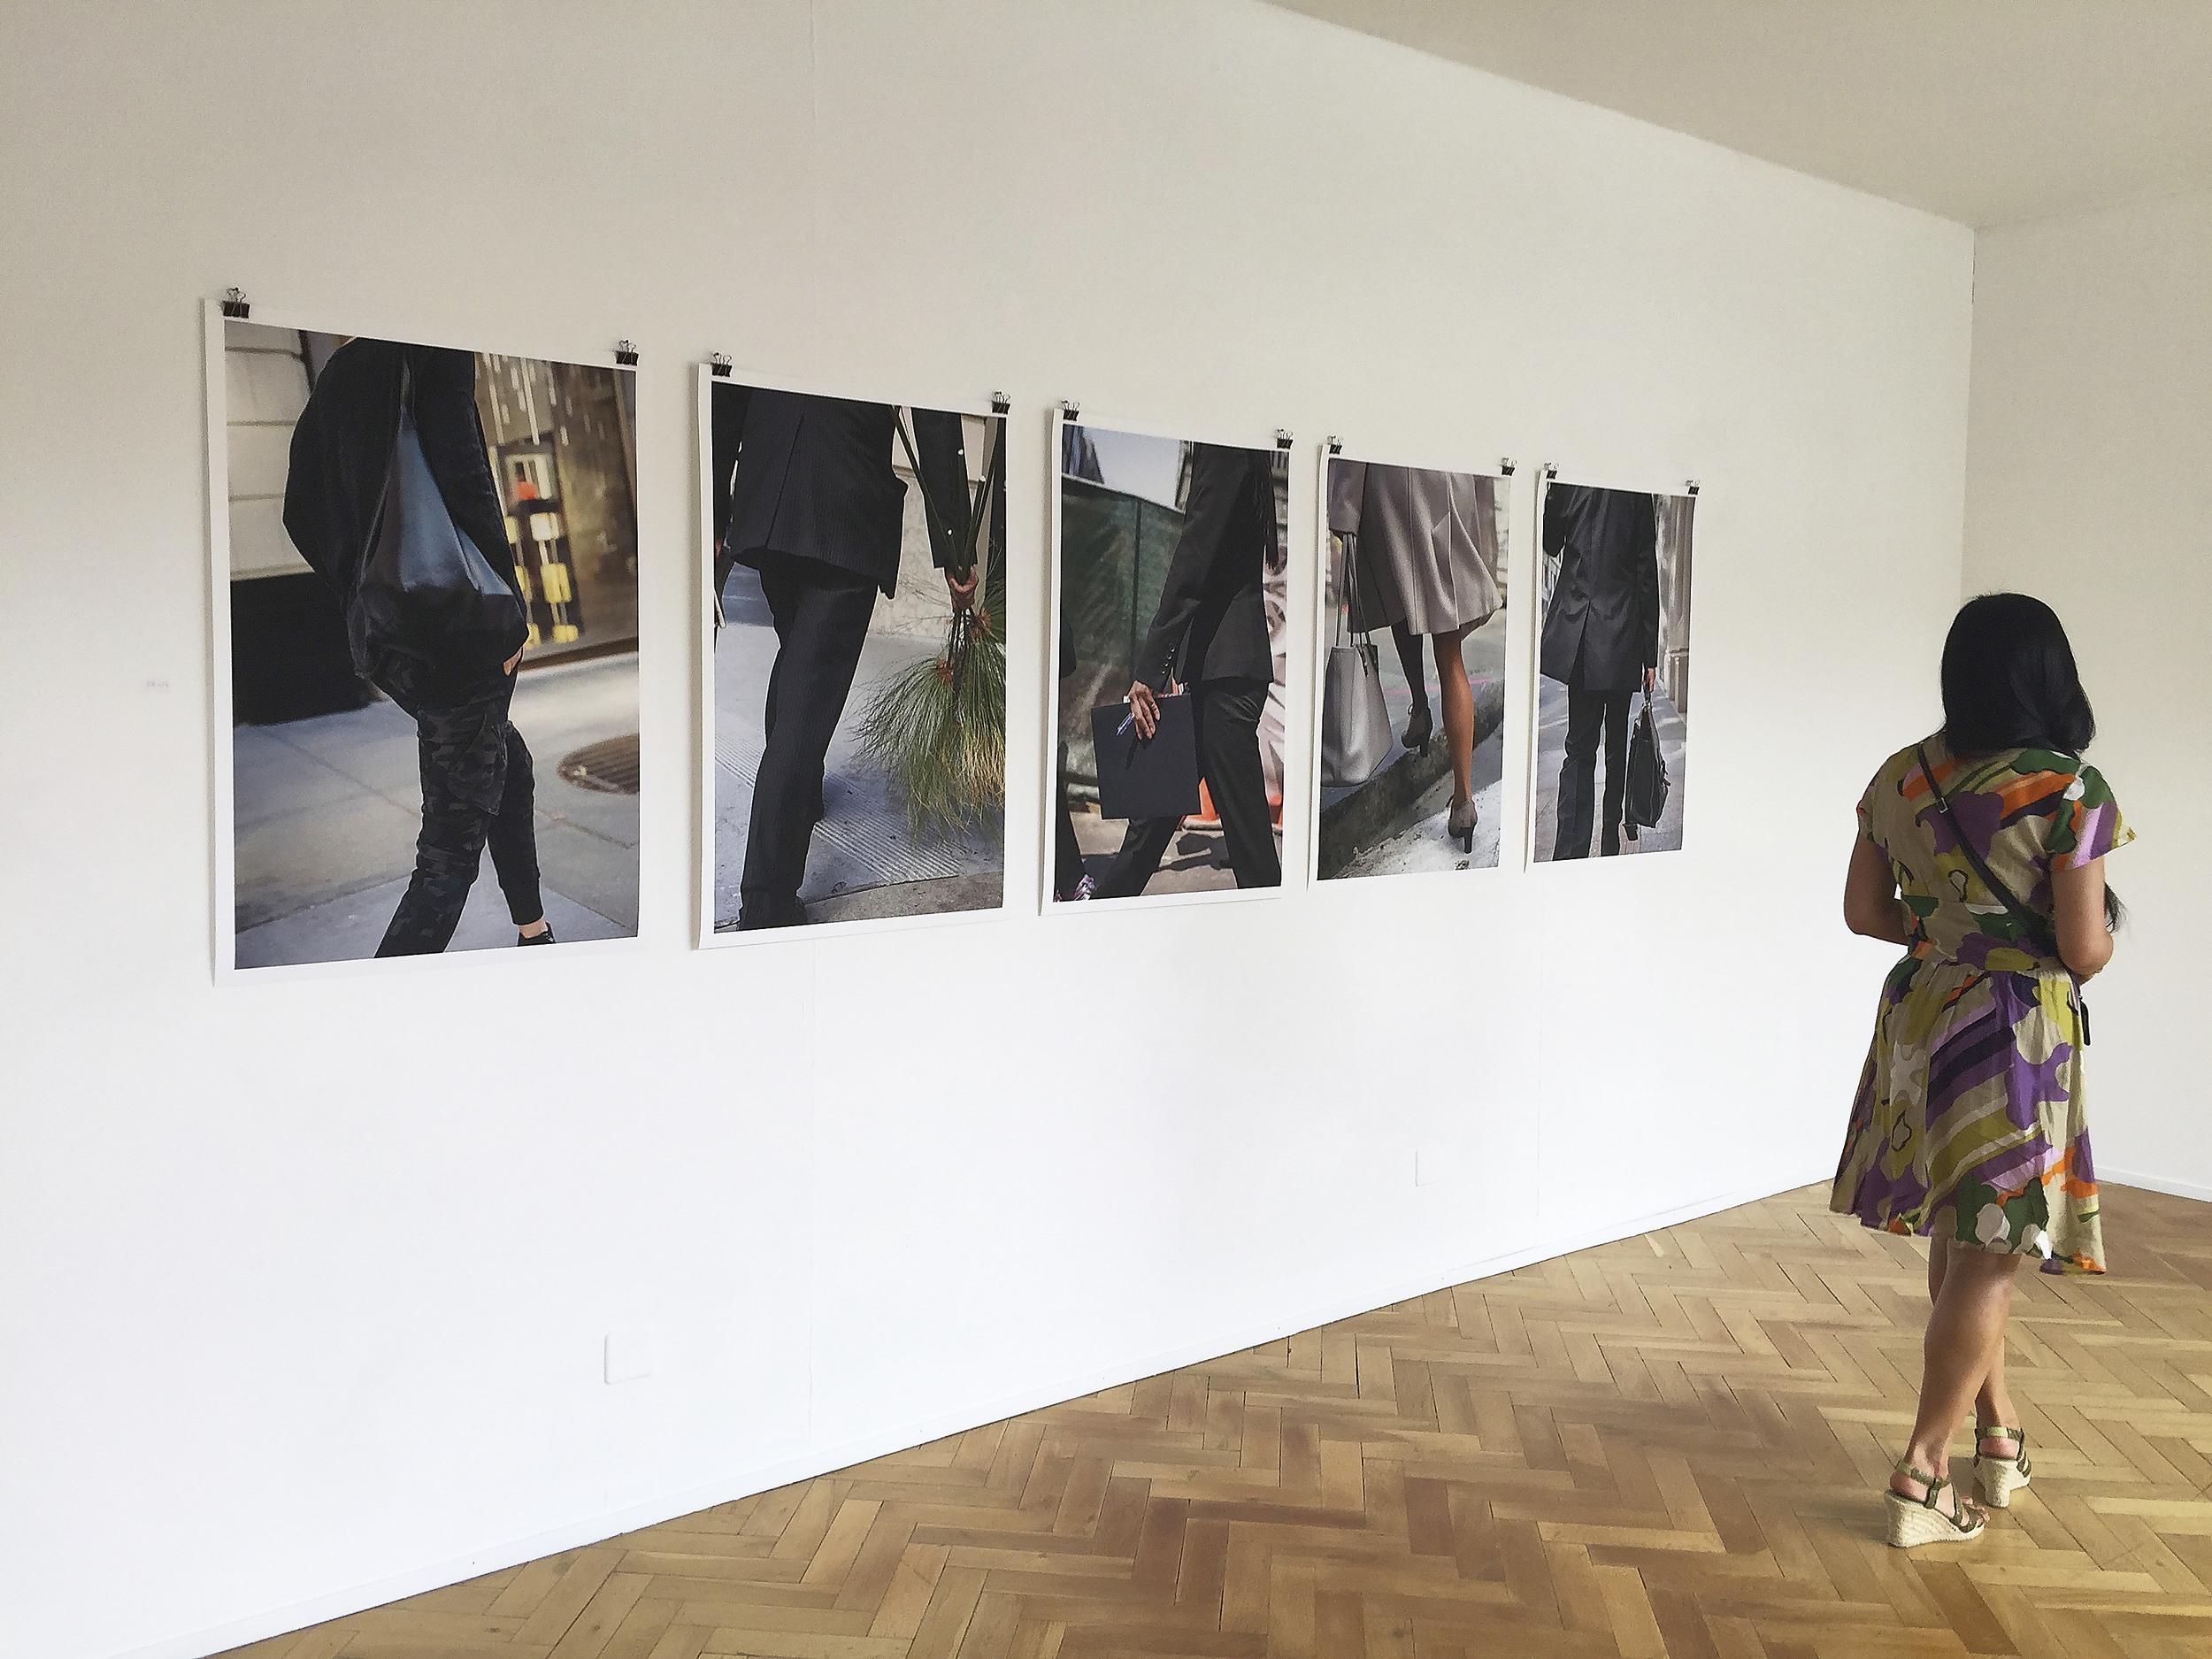 """My wall"" - photo by  Christian Habermeier - thank you Christian!"